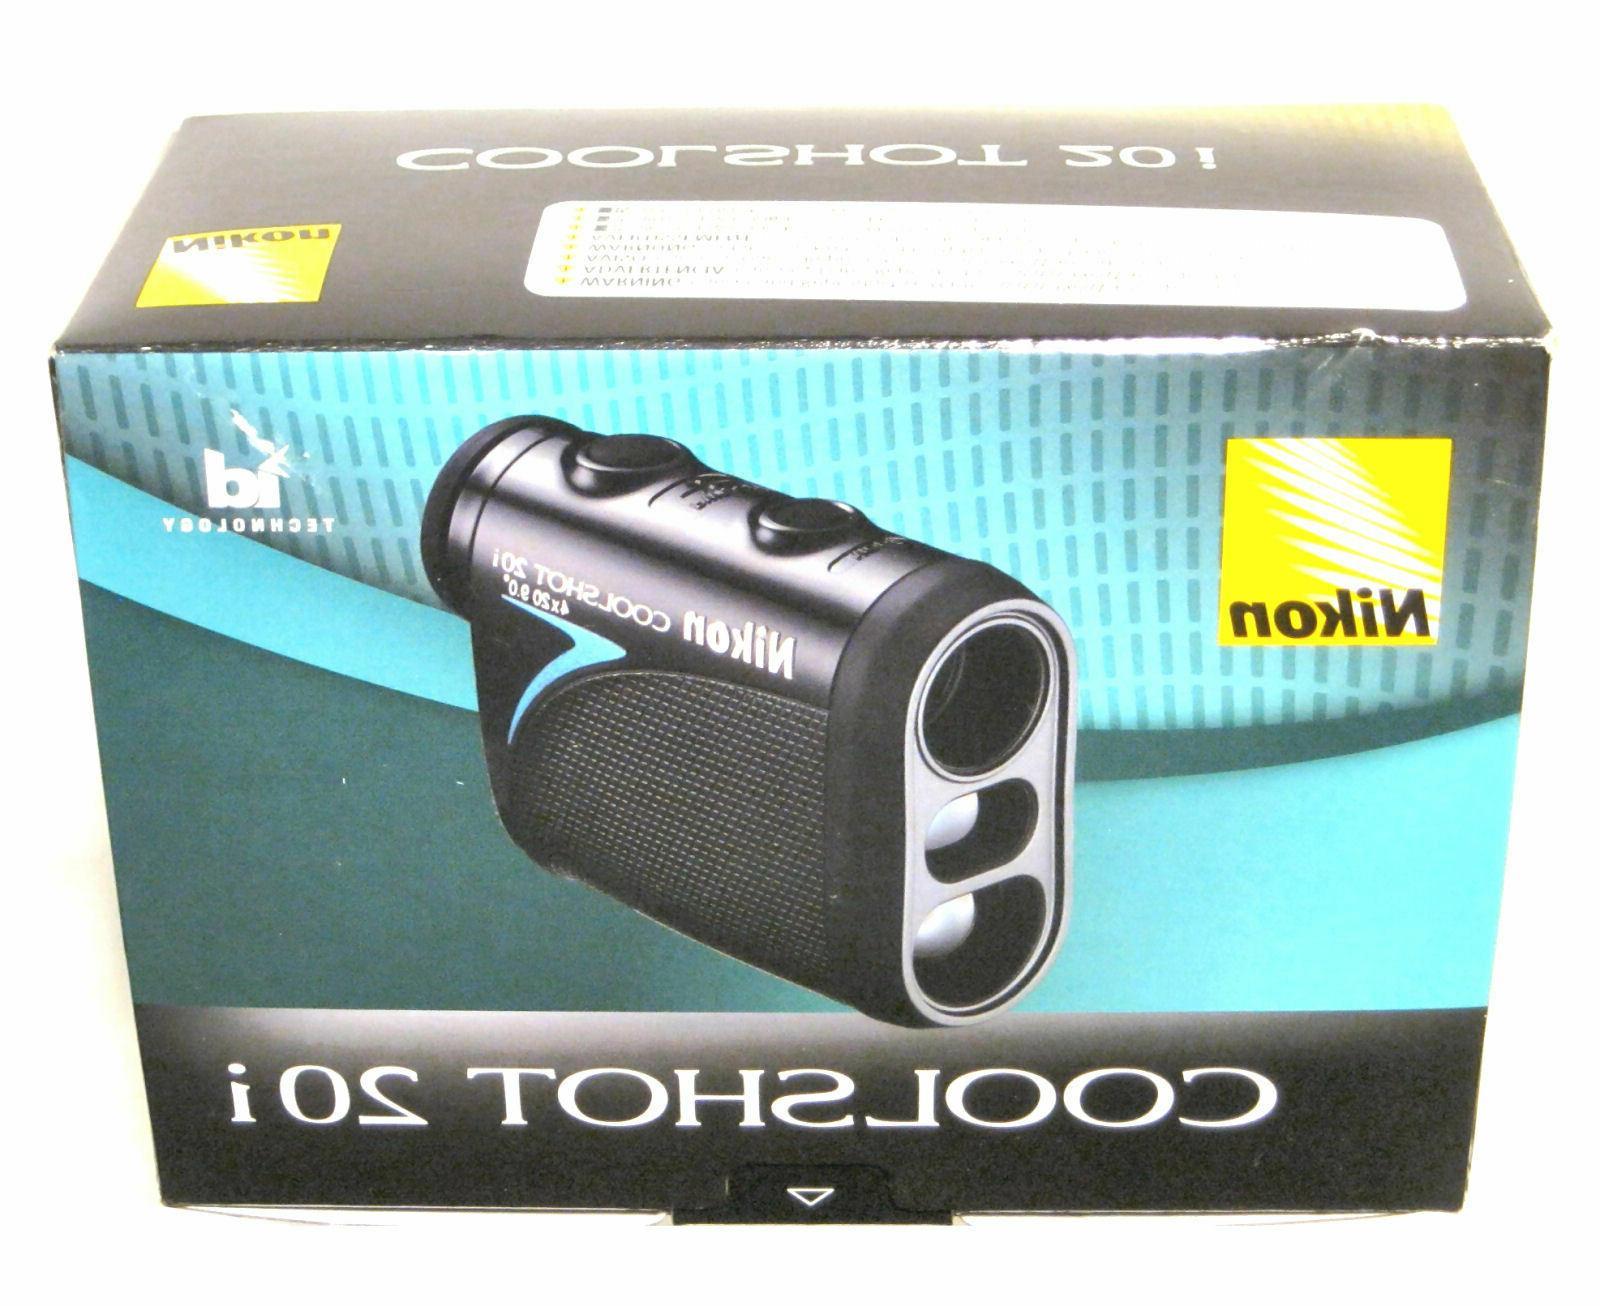 Nikon 20i Laser Rangefinder id Technology